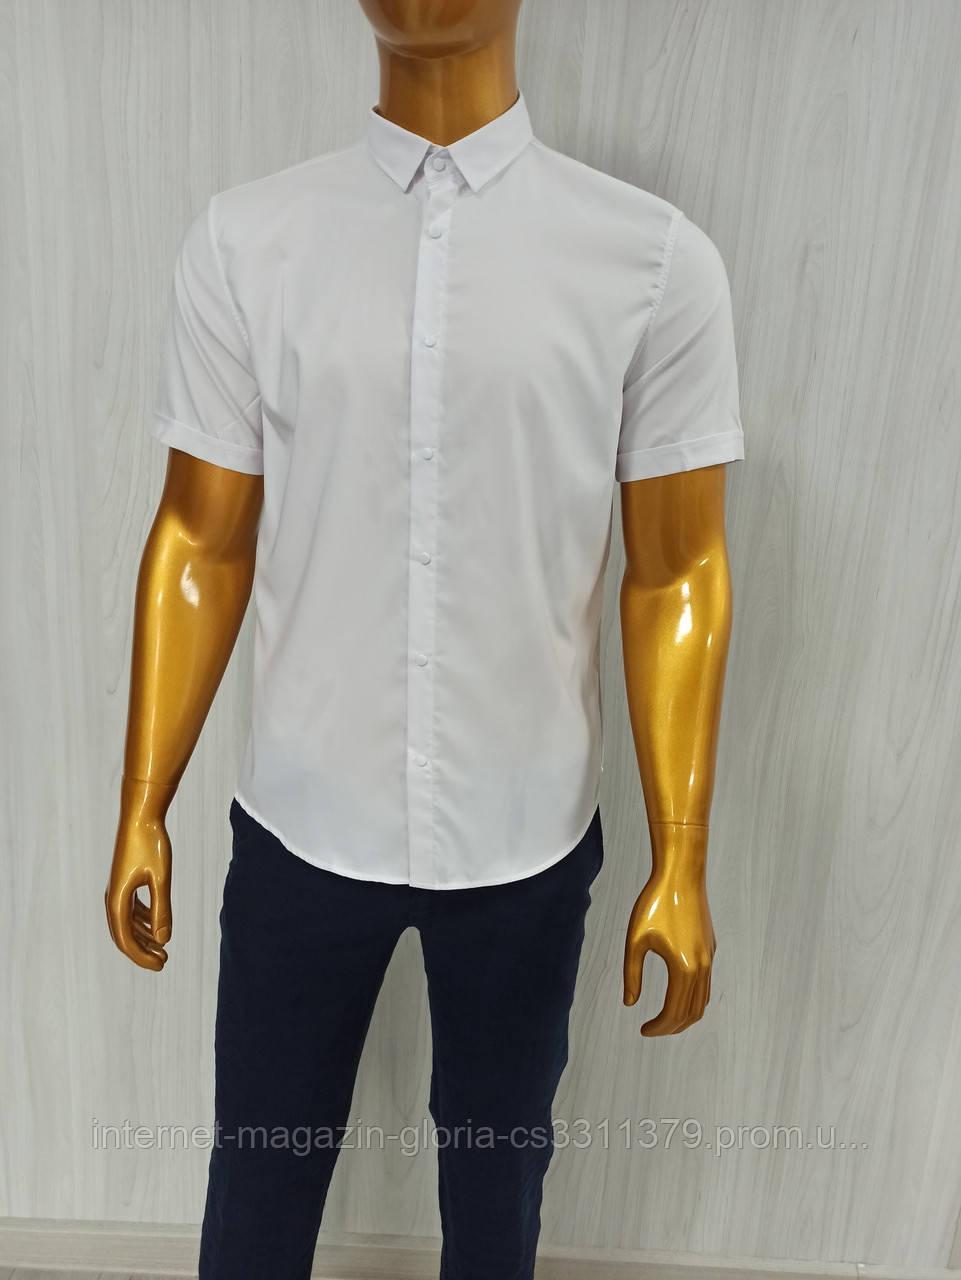 Мужская рубашка Amato. AG.18681-2. Размеры:M,L,XL(2), XXL.